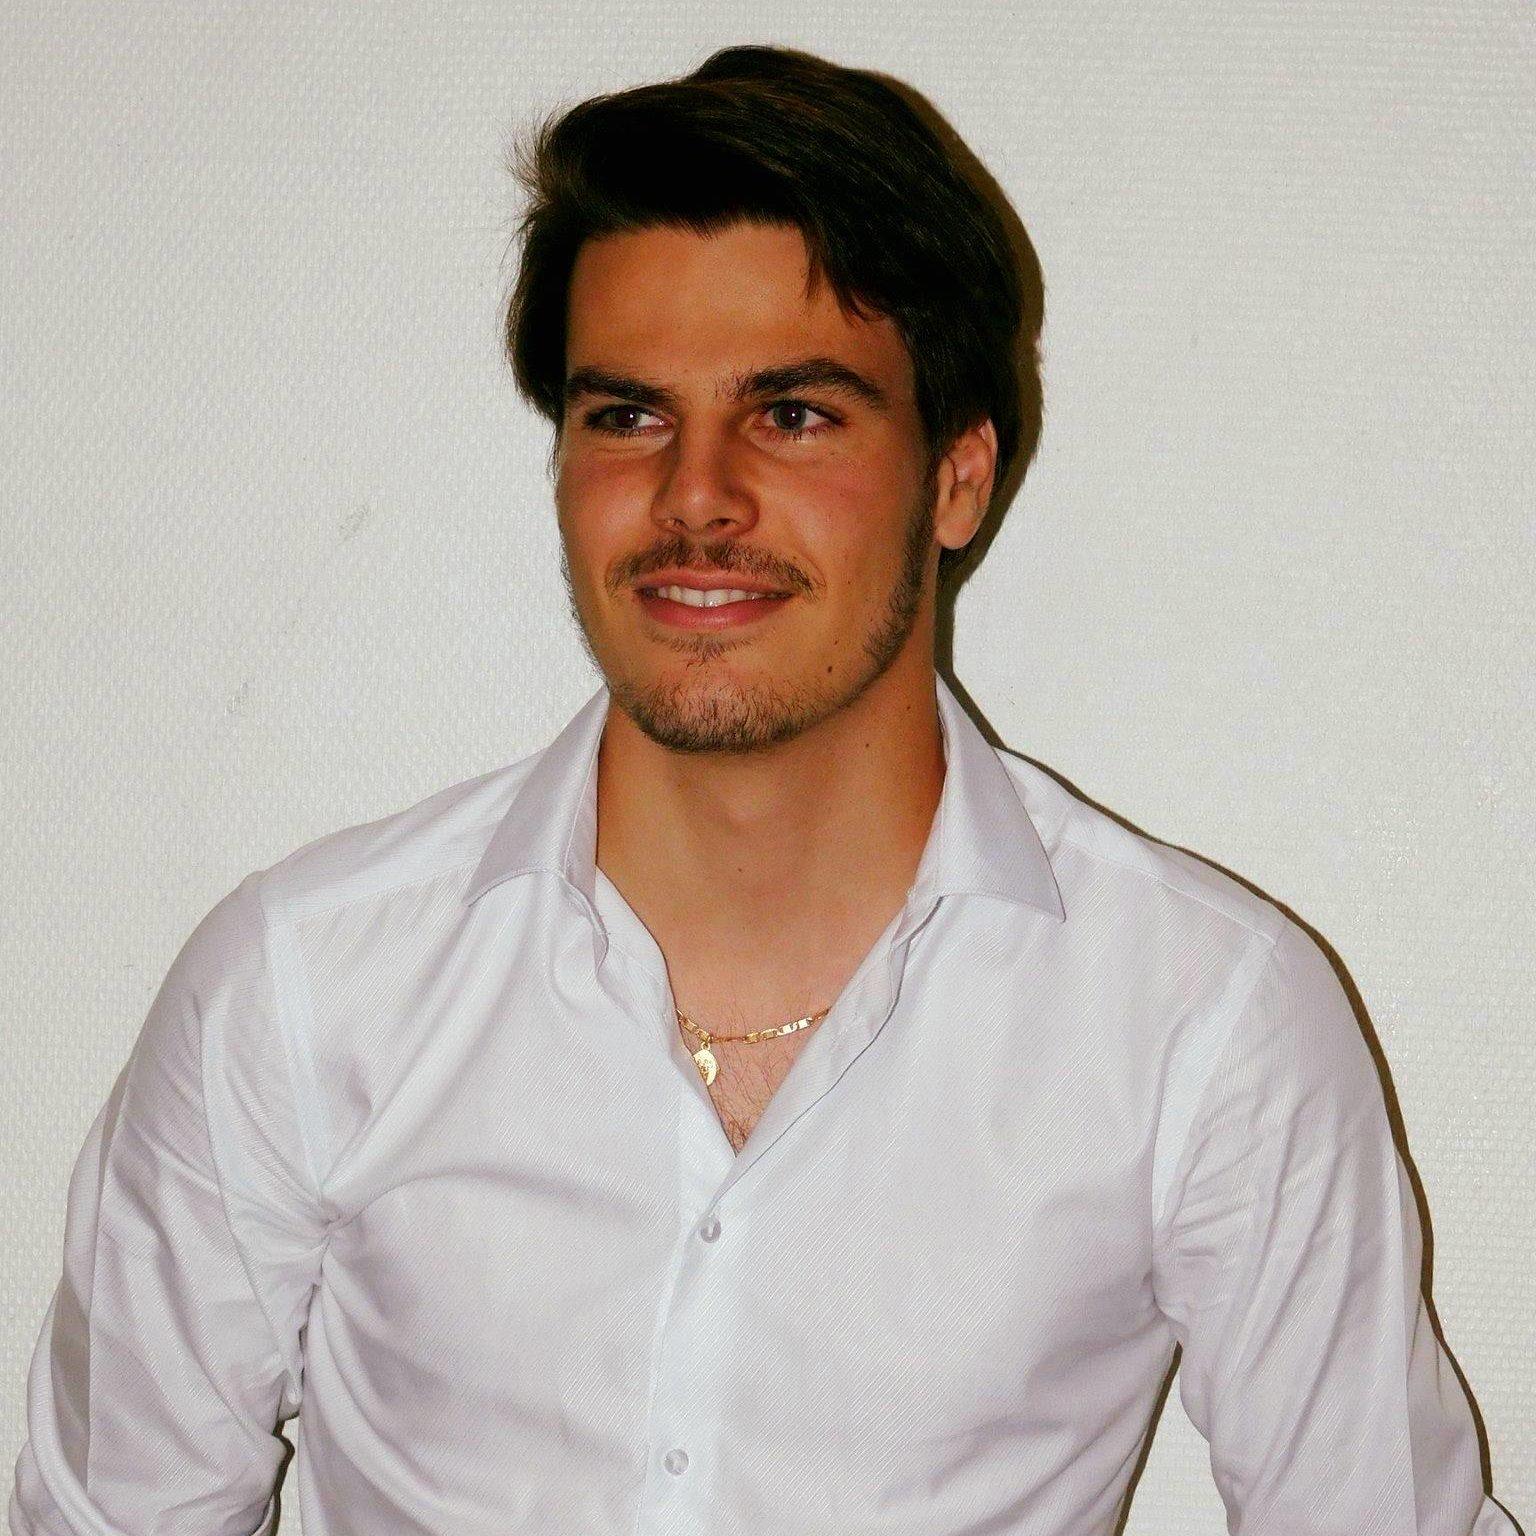 Julien Chaffurin